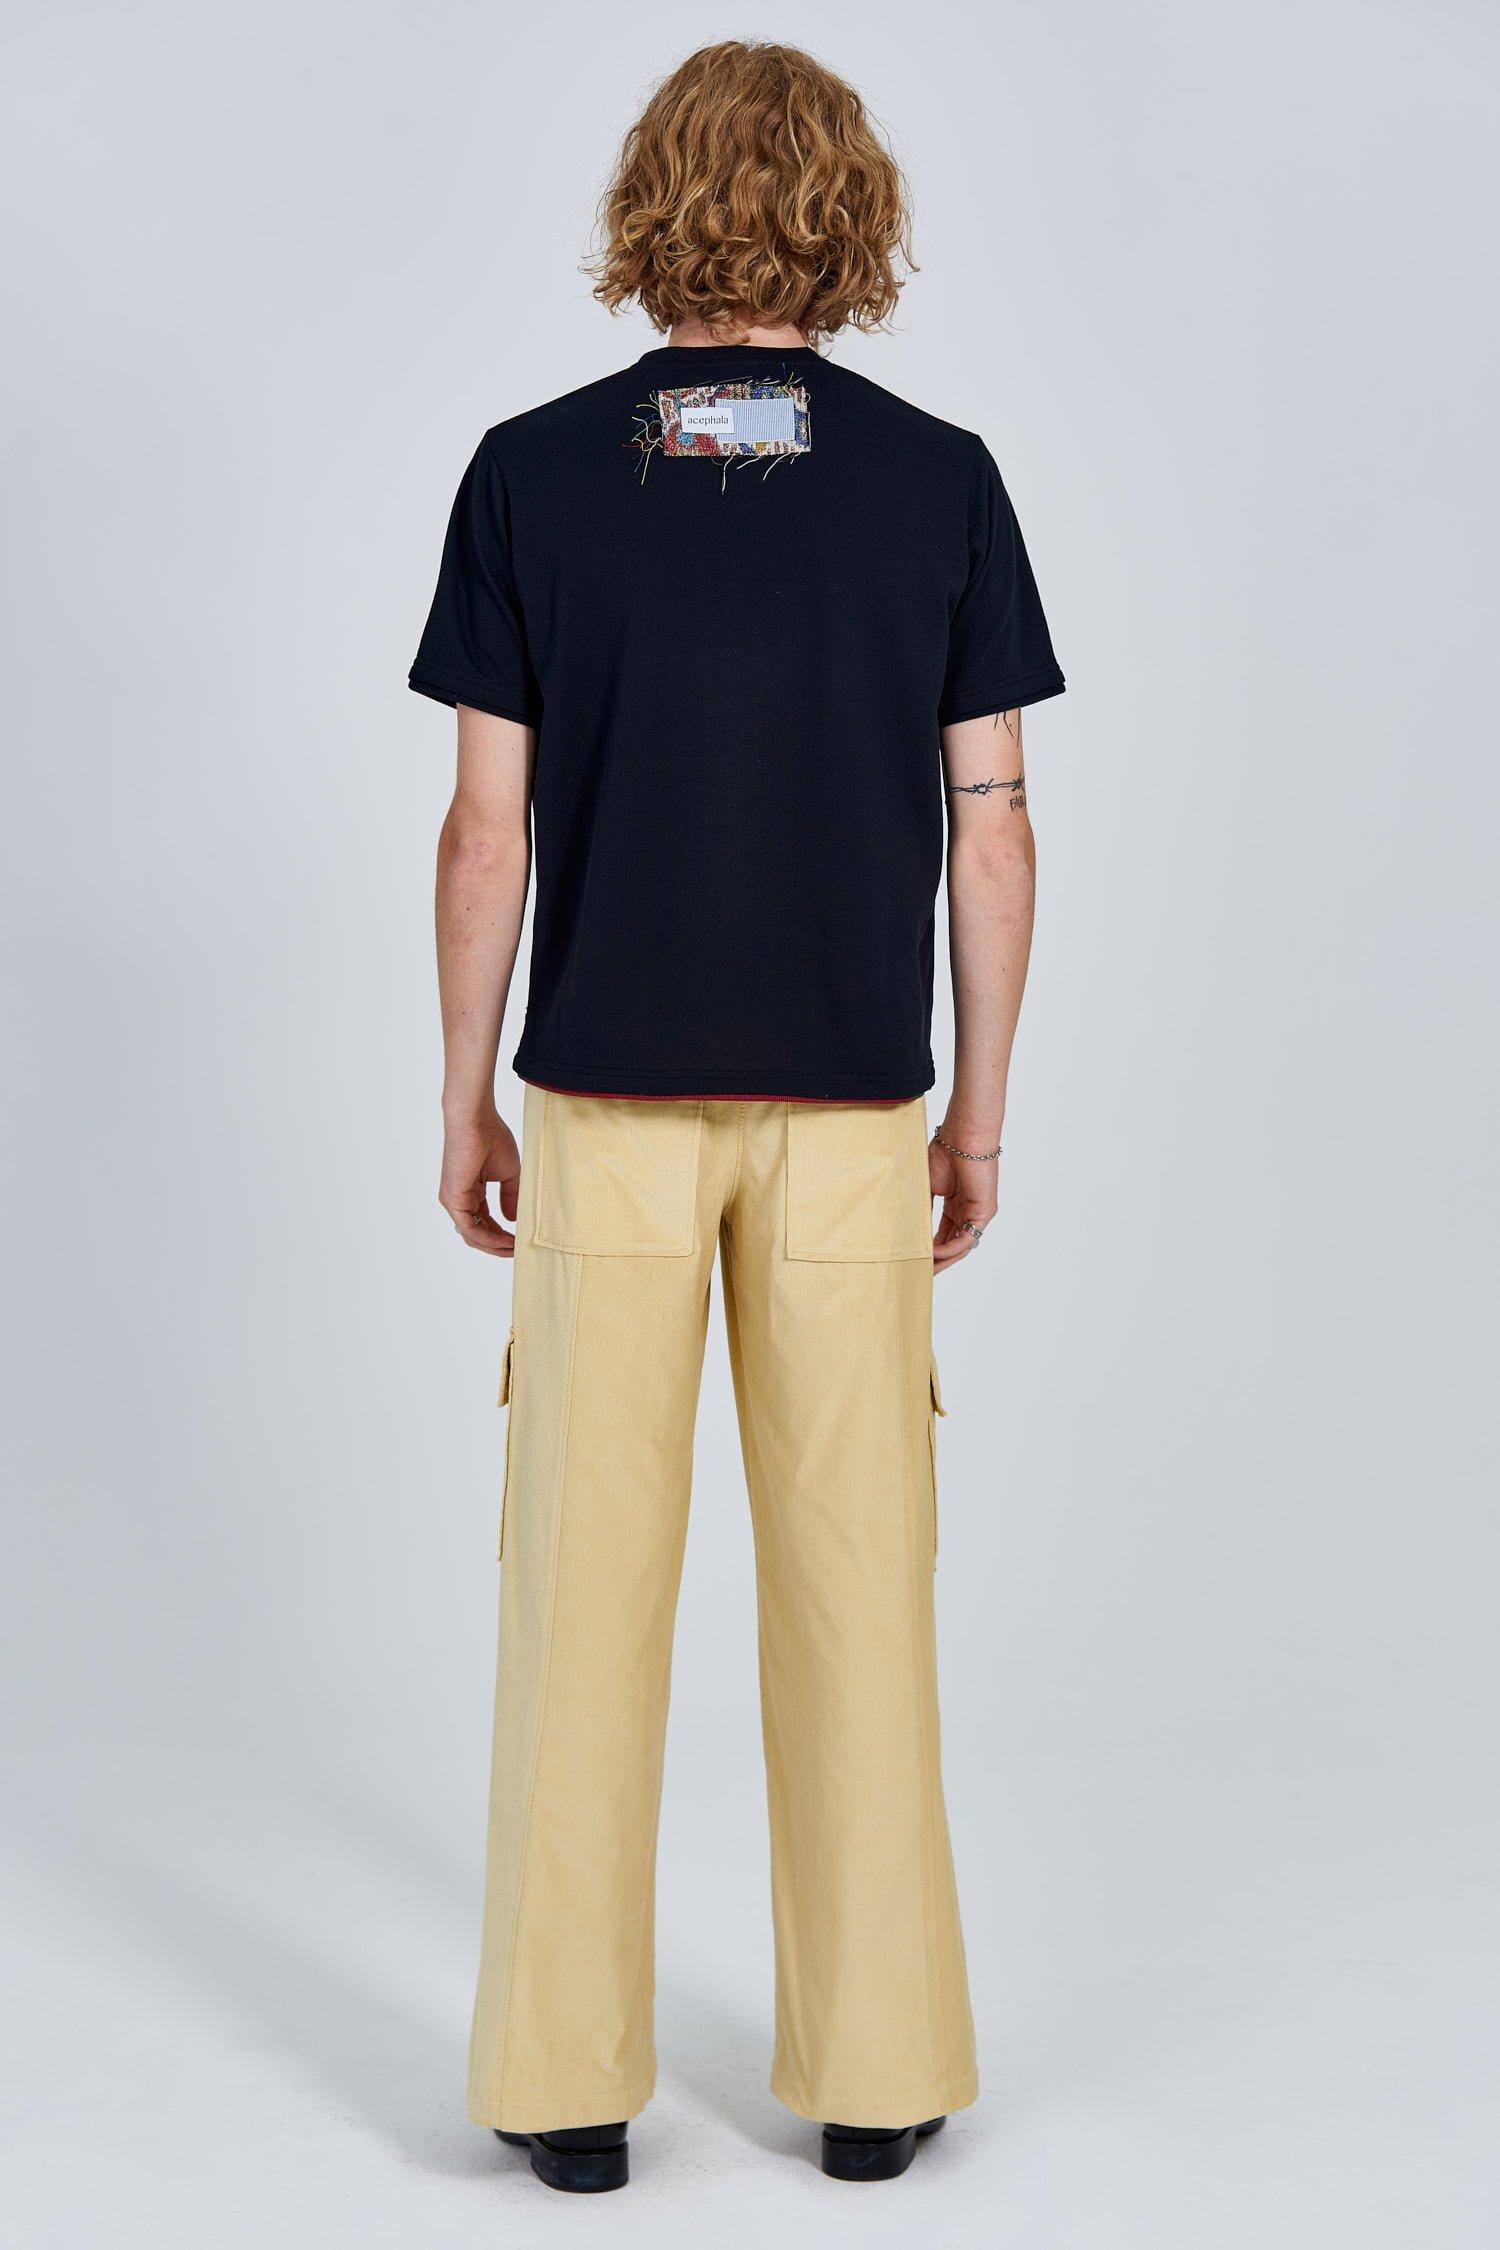 Acephala Fw 2020 21 Black Unisex T Shirt Back Patch Male Back